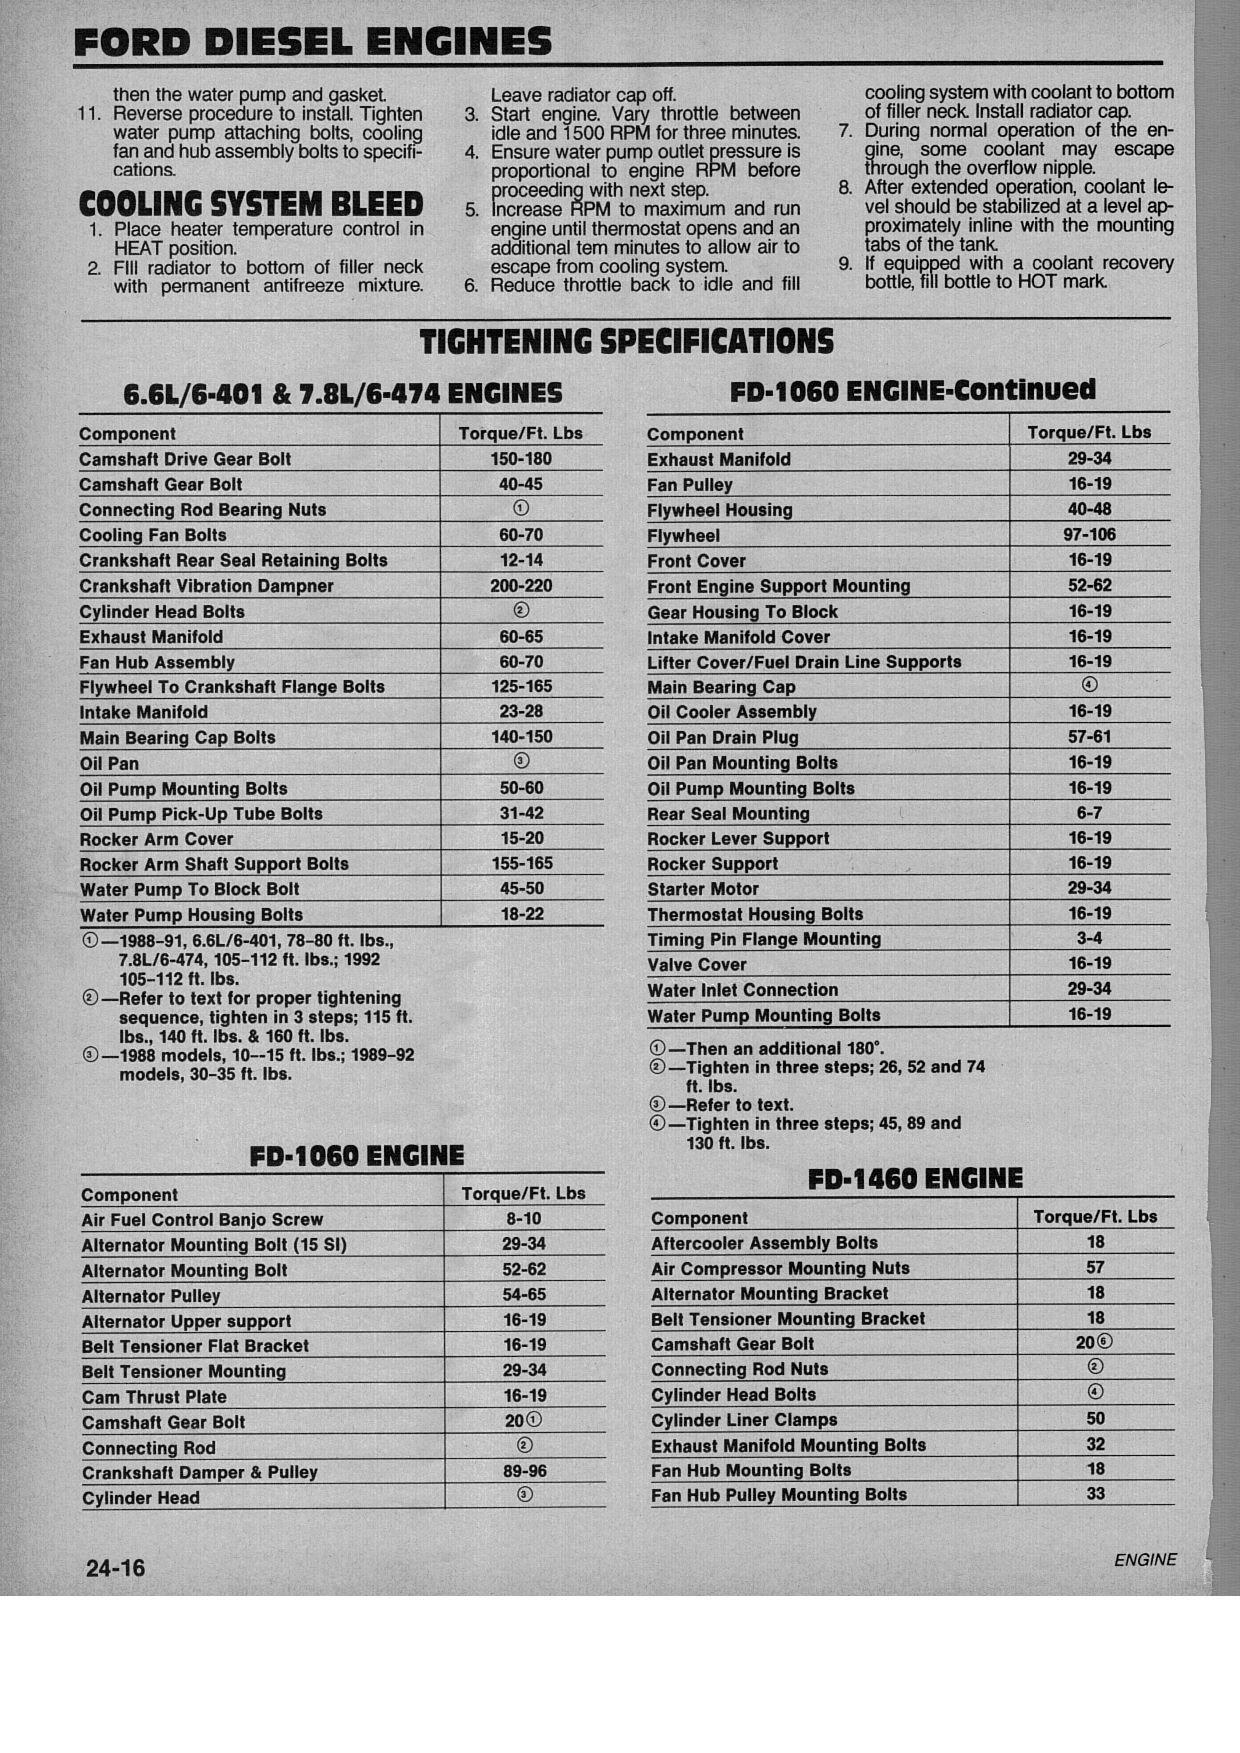 Detroit diesel 4 71 Manual Answers